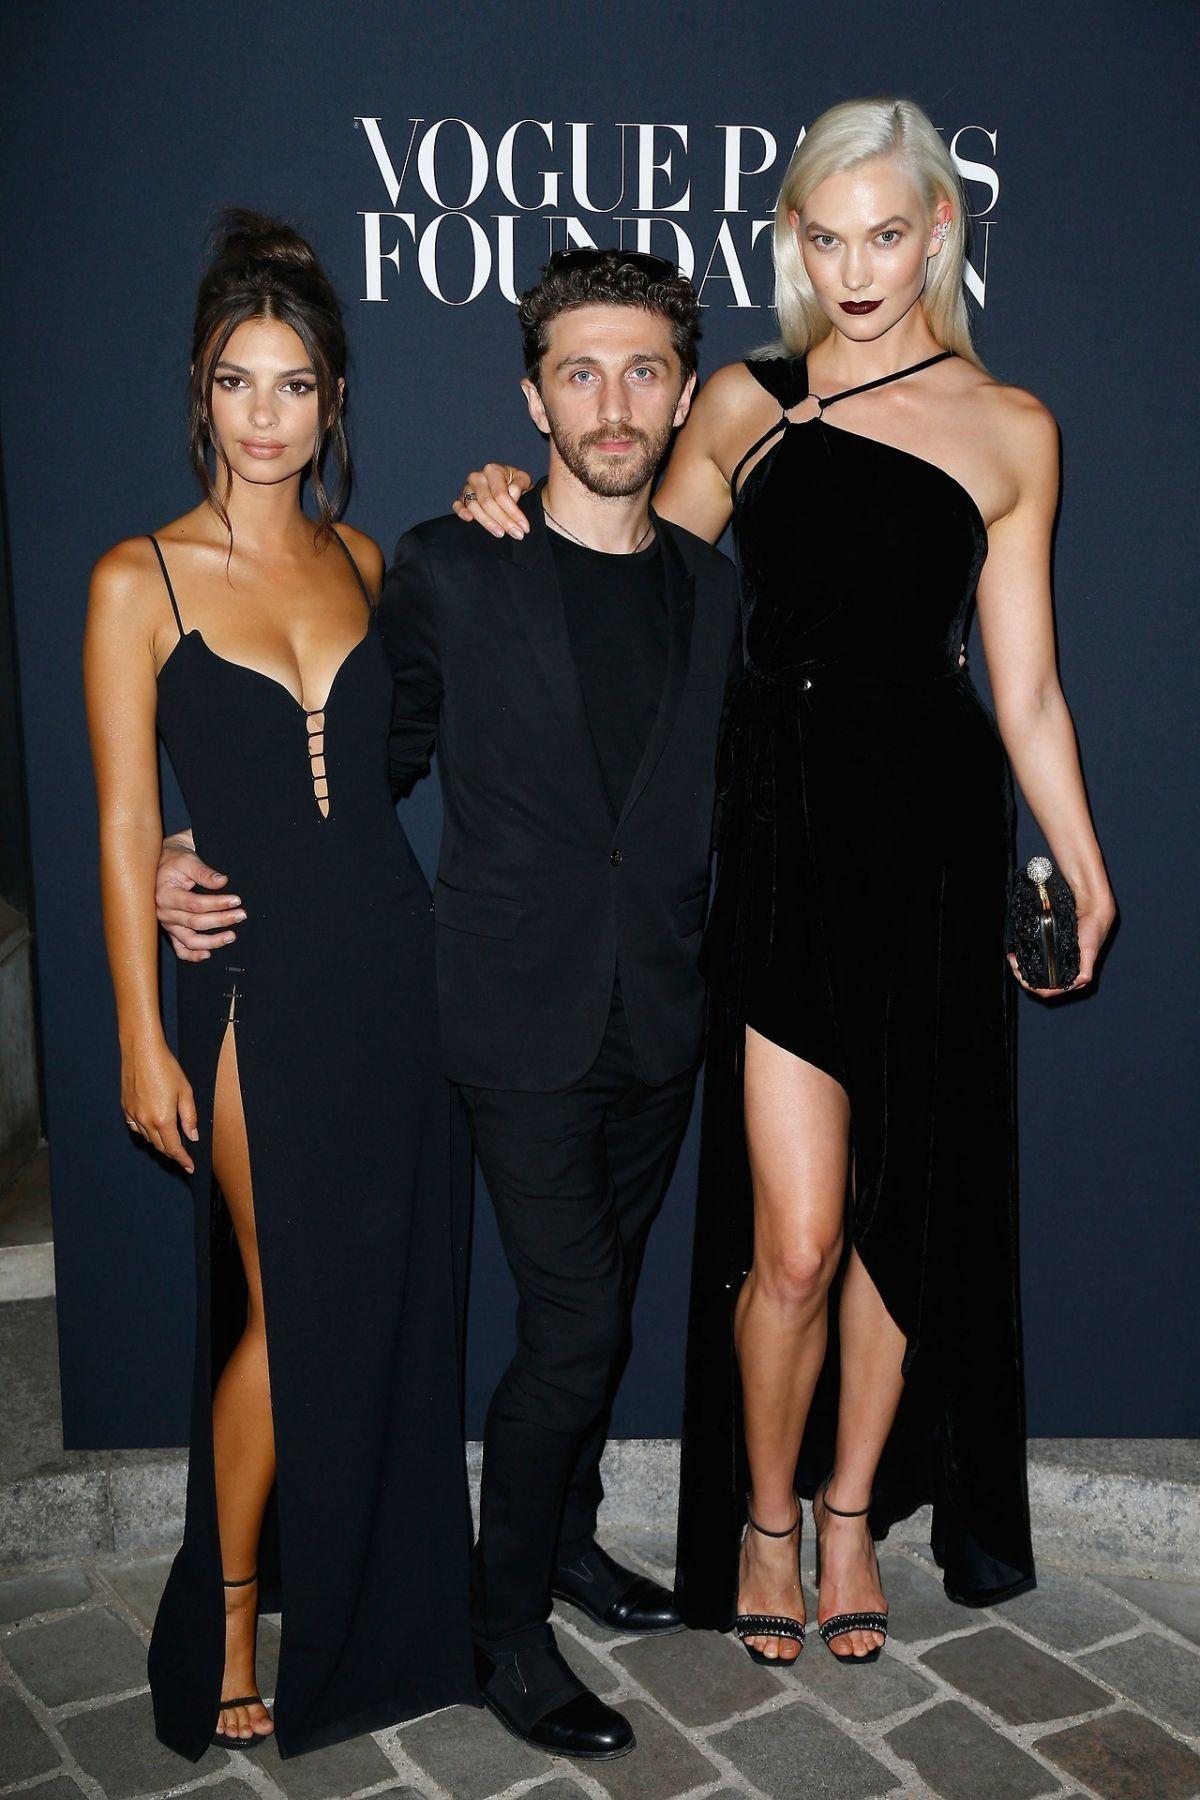 EMILY RATAJKOWSKI and KARLIE KLOSS at Vogue Foundation Dinner in Paris 07/4/2017 – HawtCelebs